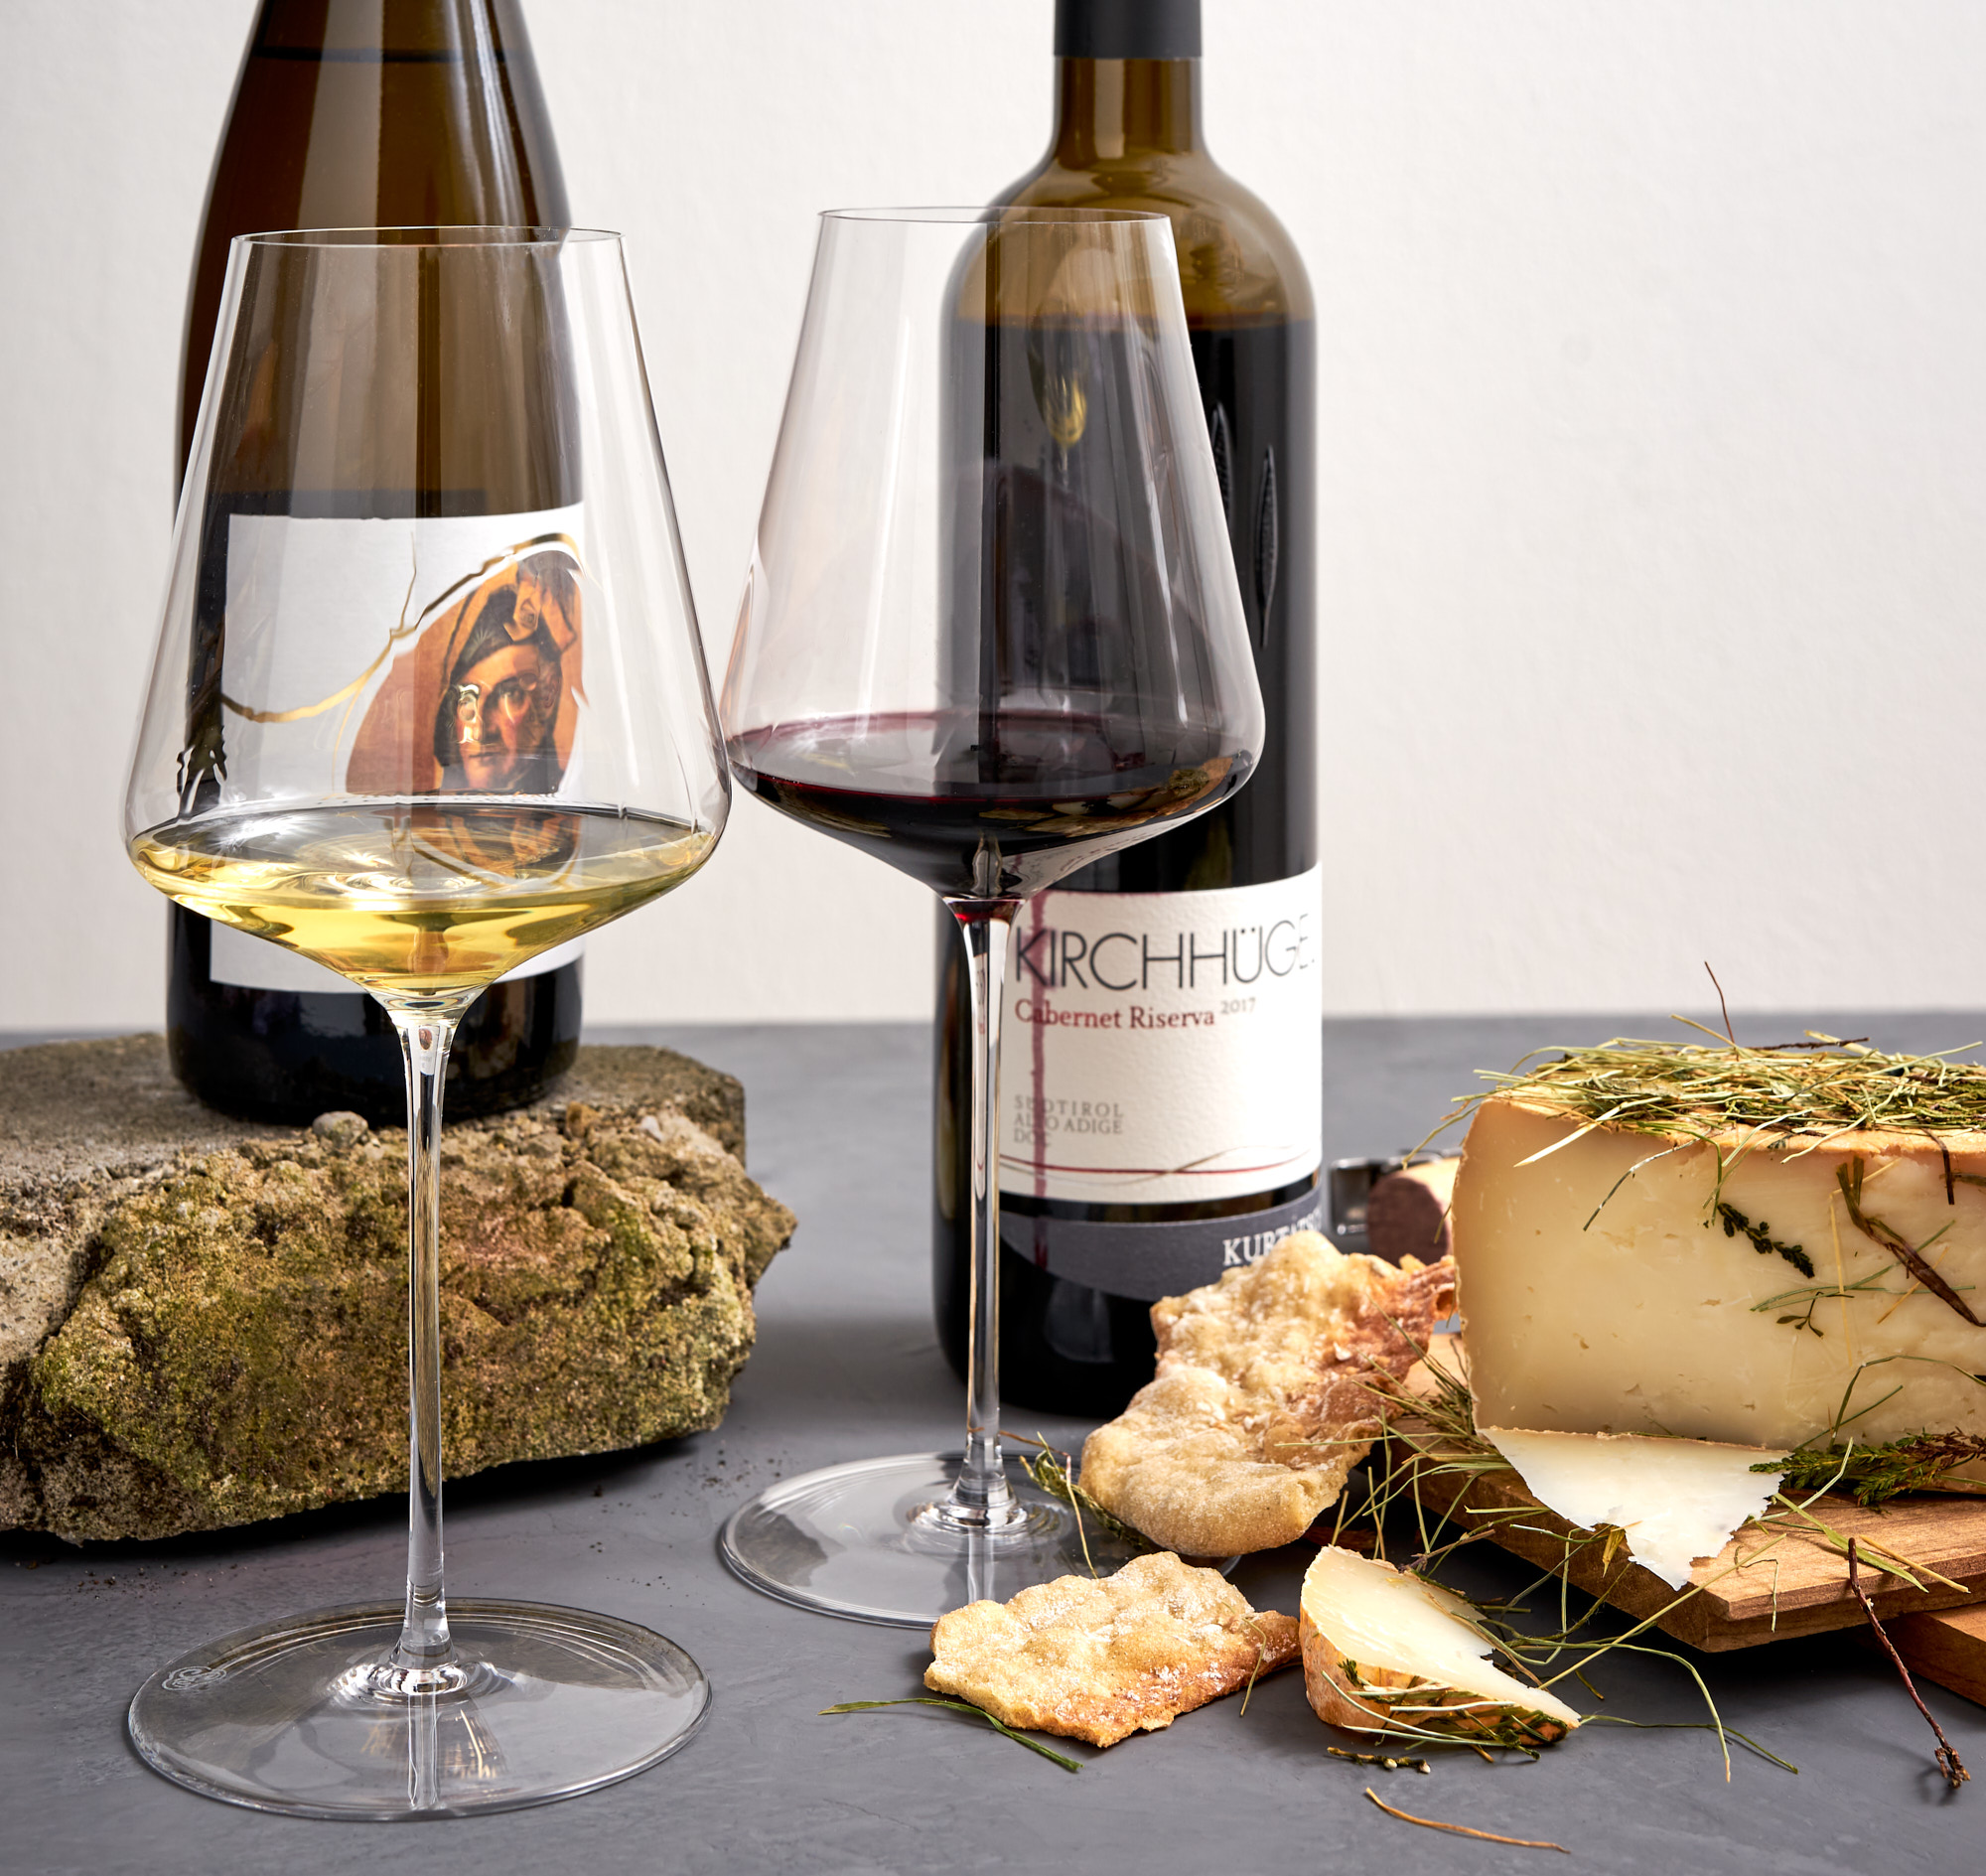 Wein aus Südtirol: Tiefenbrunner Müller Thurgau Feldmarschall und Kellerei Kurtatsch Cabernet Riserva Kirchhügel